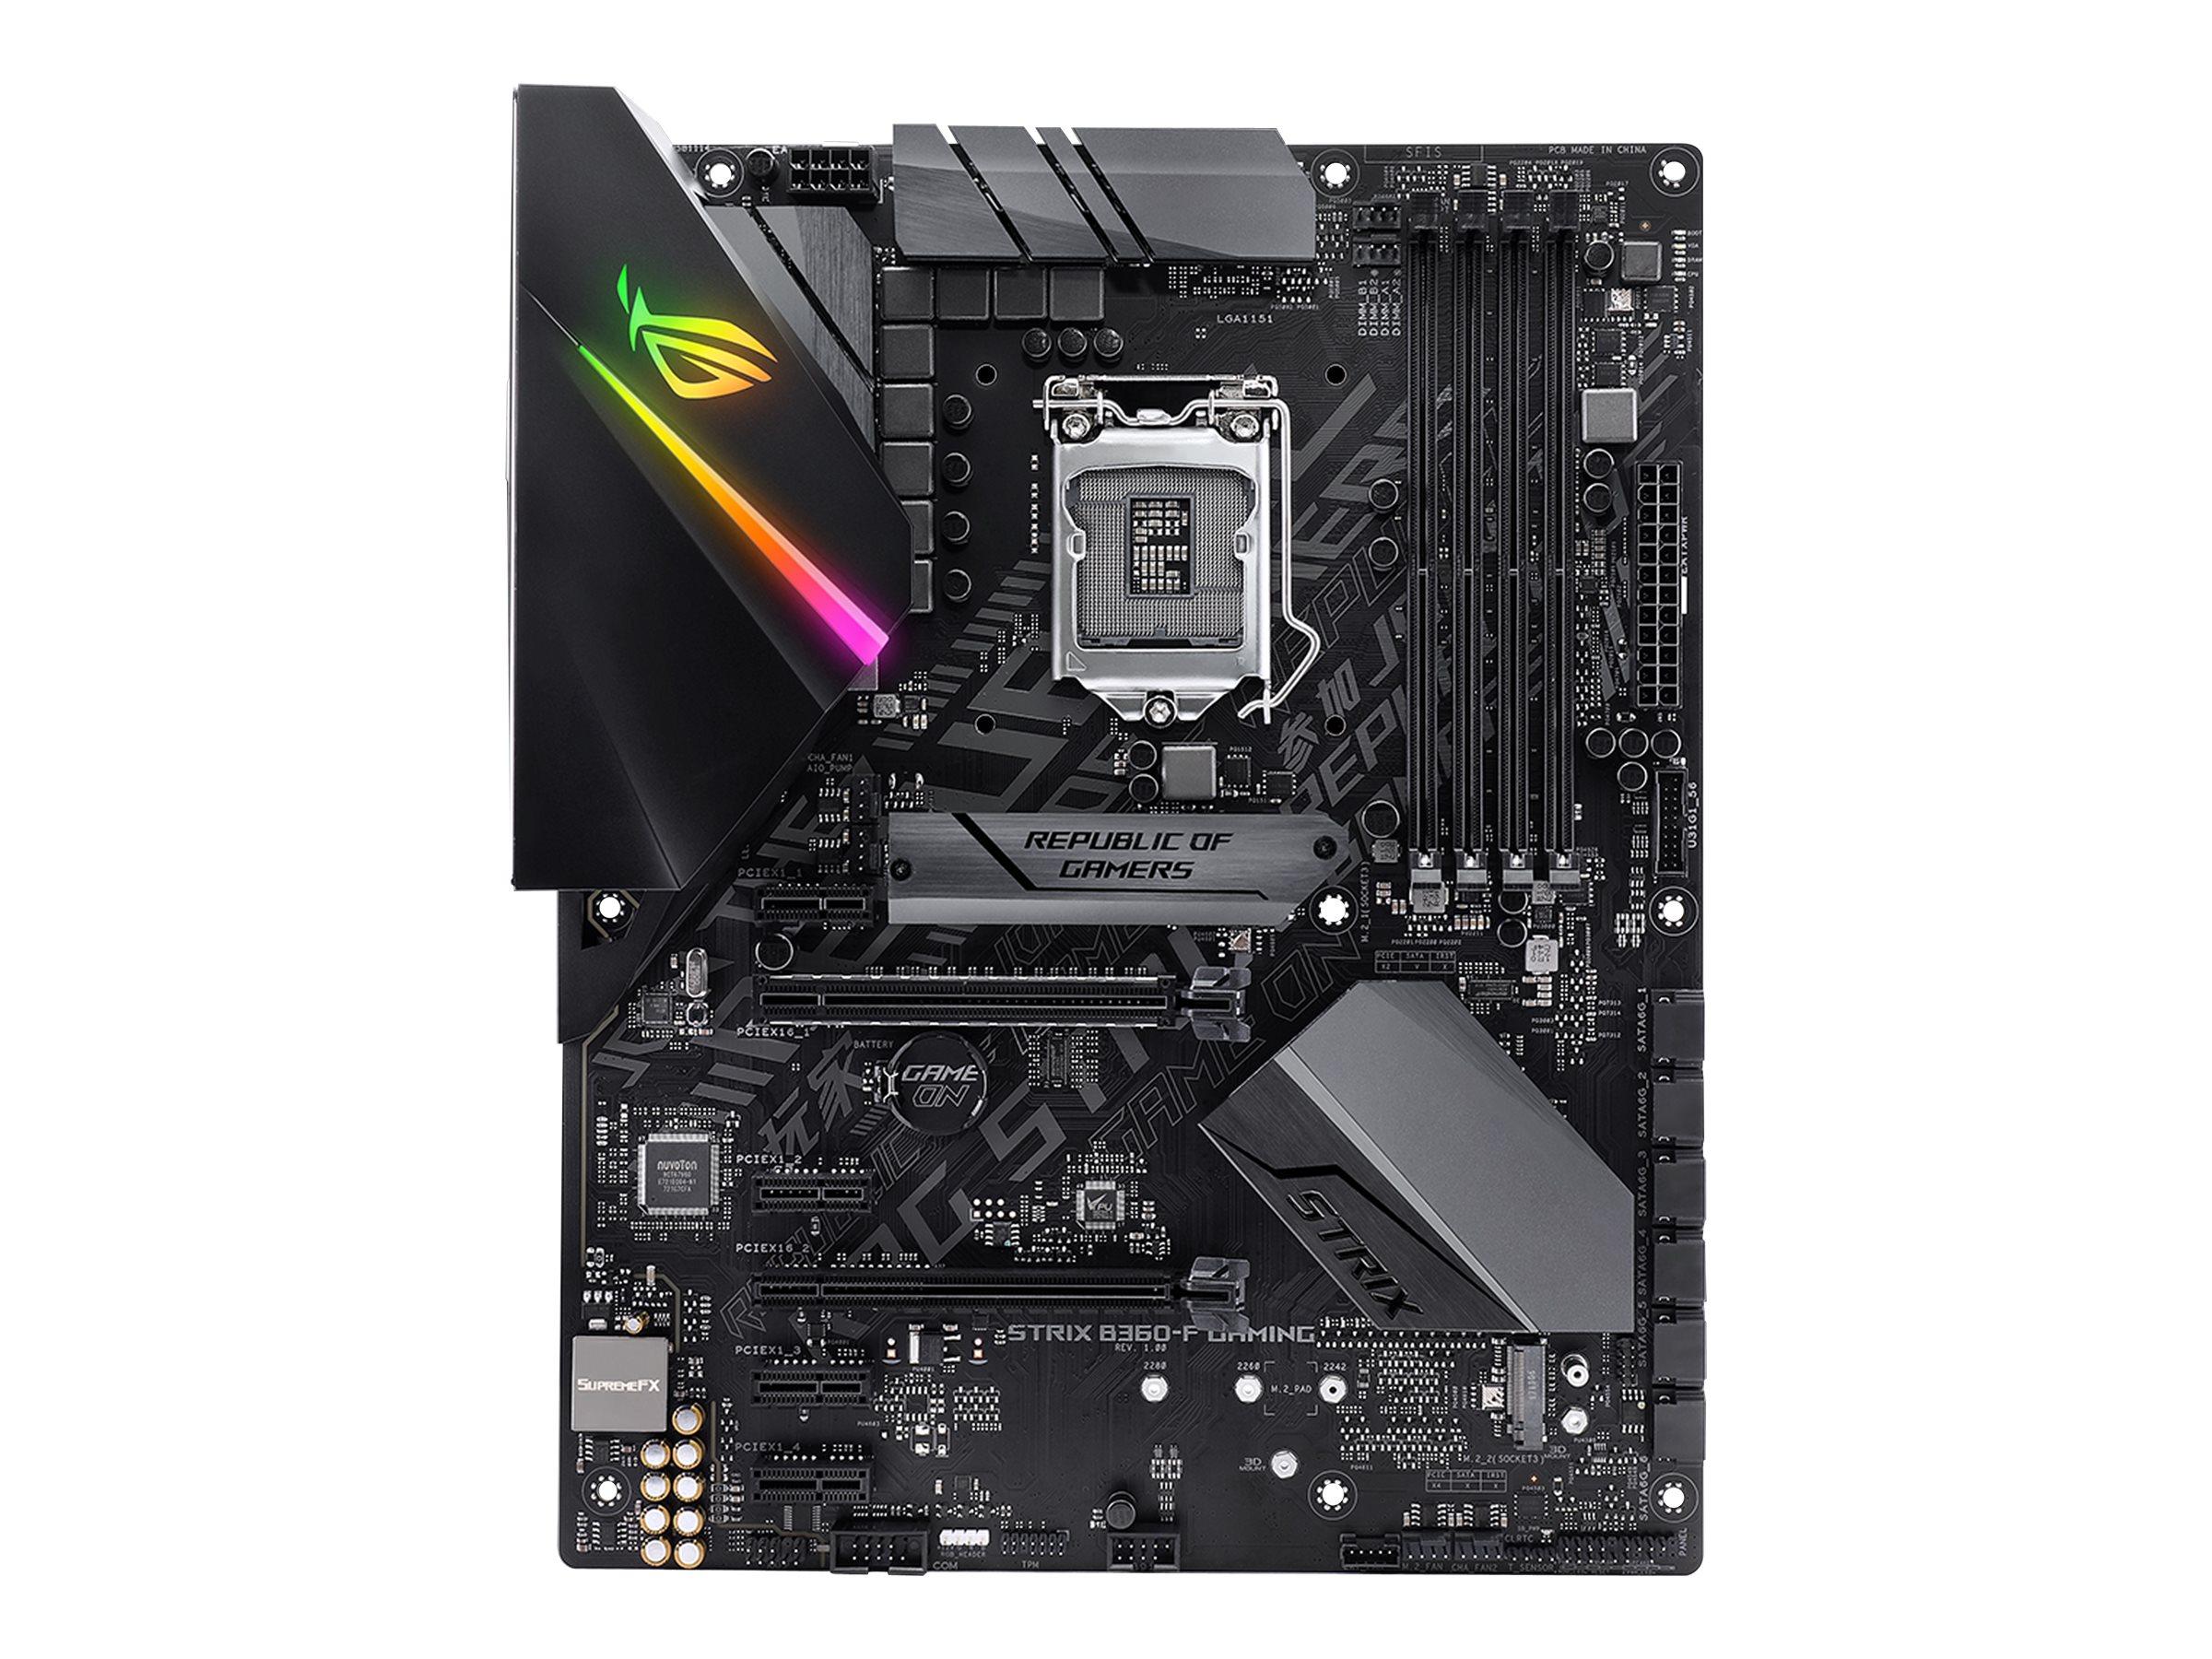 ASUS ROG STRIX B360-F GAMING - Motherboard - ATX - LGA1151 Socket - B360 - USB 3.1 Gen 1, USB-C Gen2, USB 3.1 Gen 2